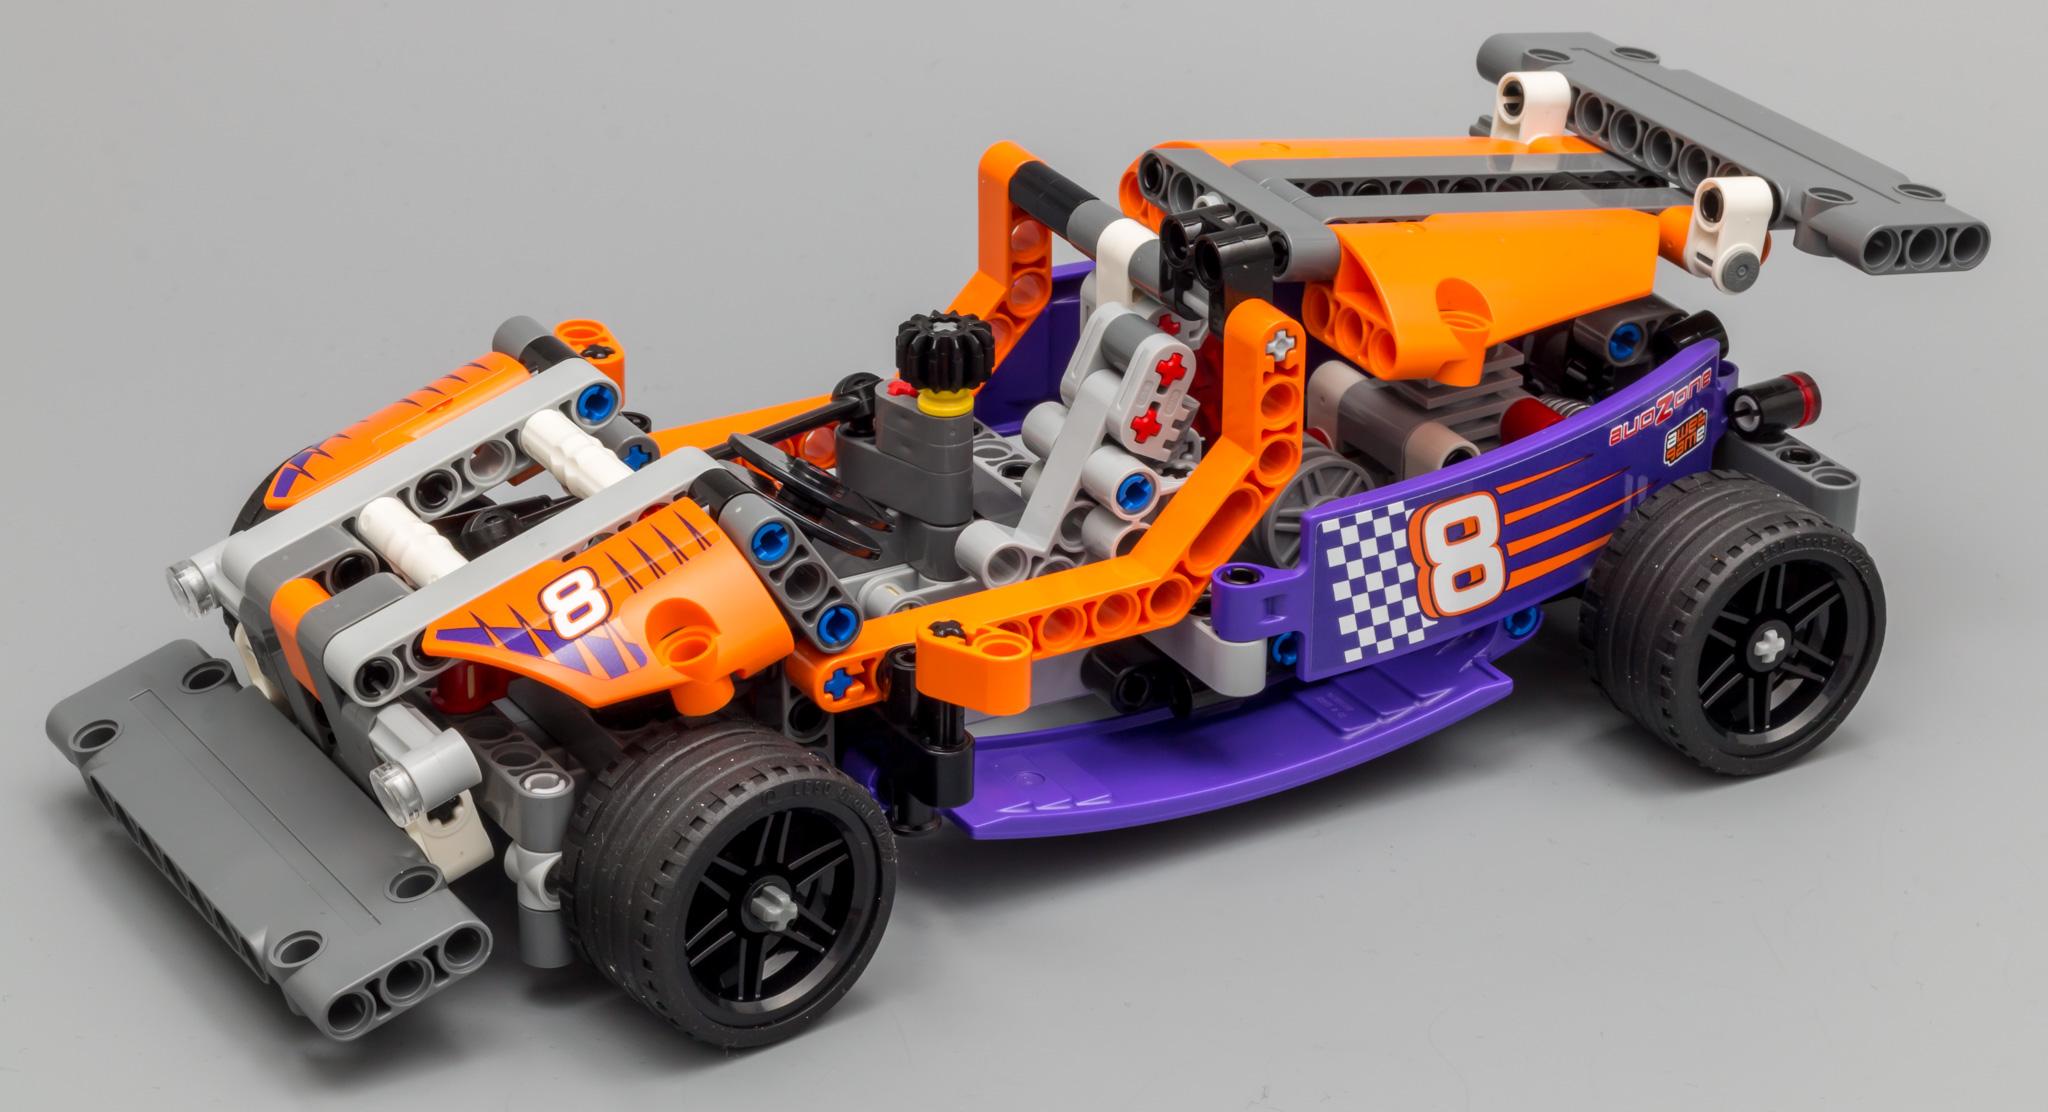 lego technic 42048 instructions